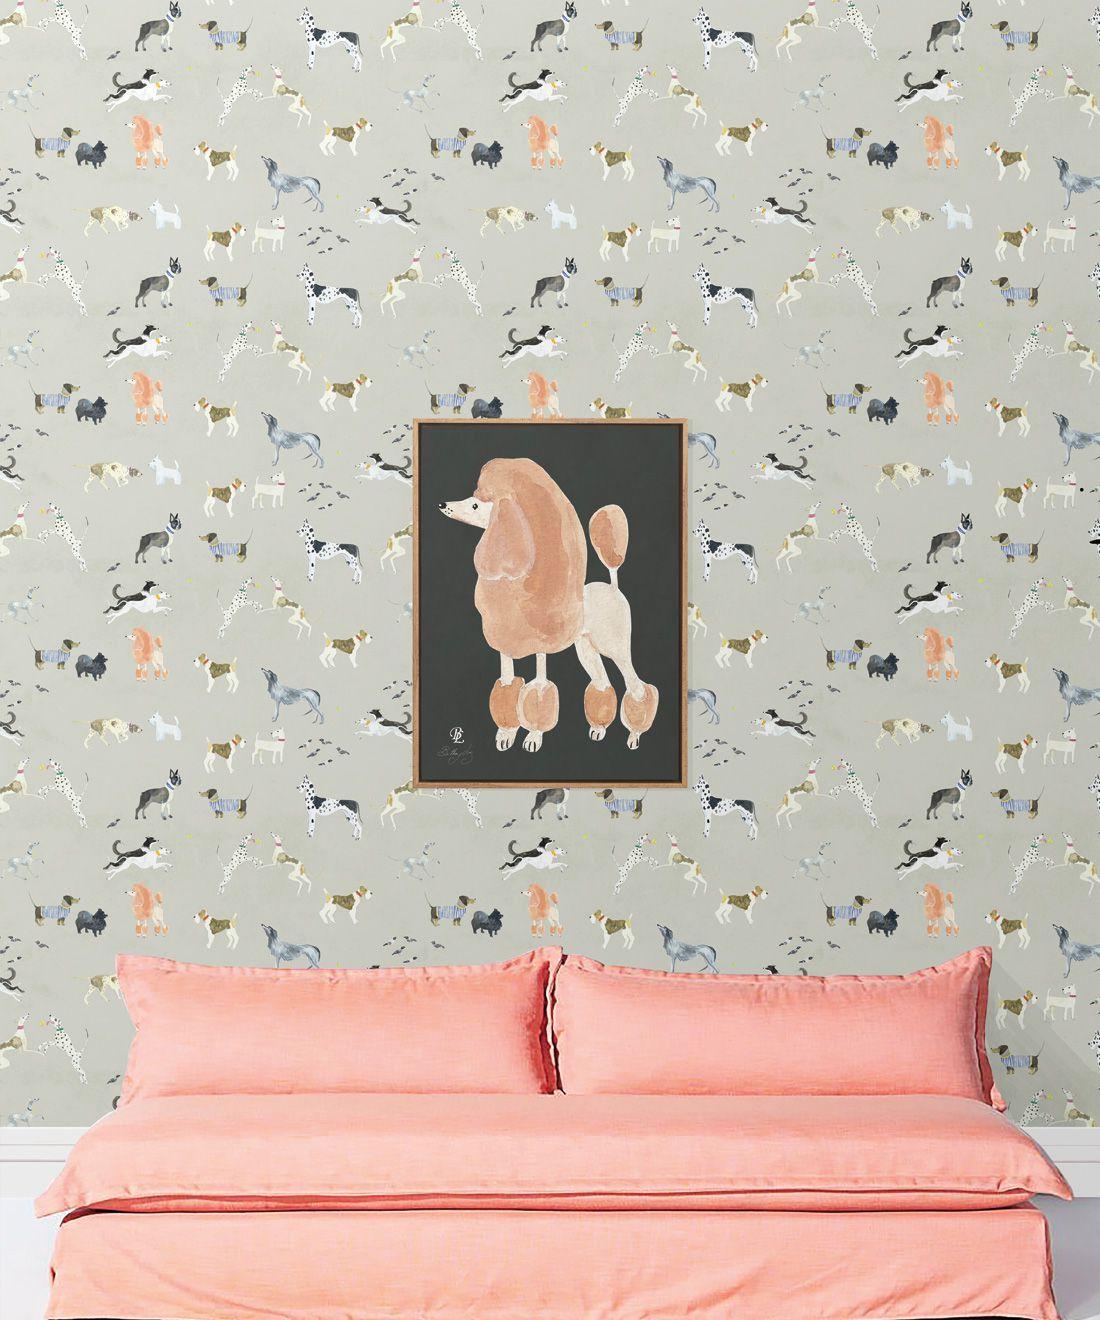 Doggies Wallpaper •Dog Wallpaper •Beige • Insitu with pink sofa